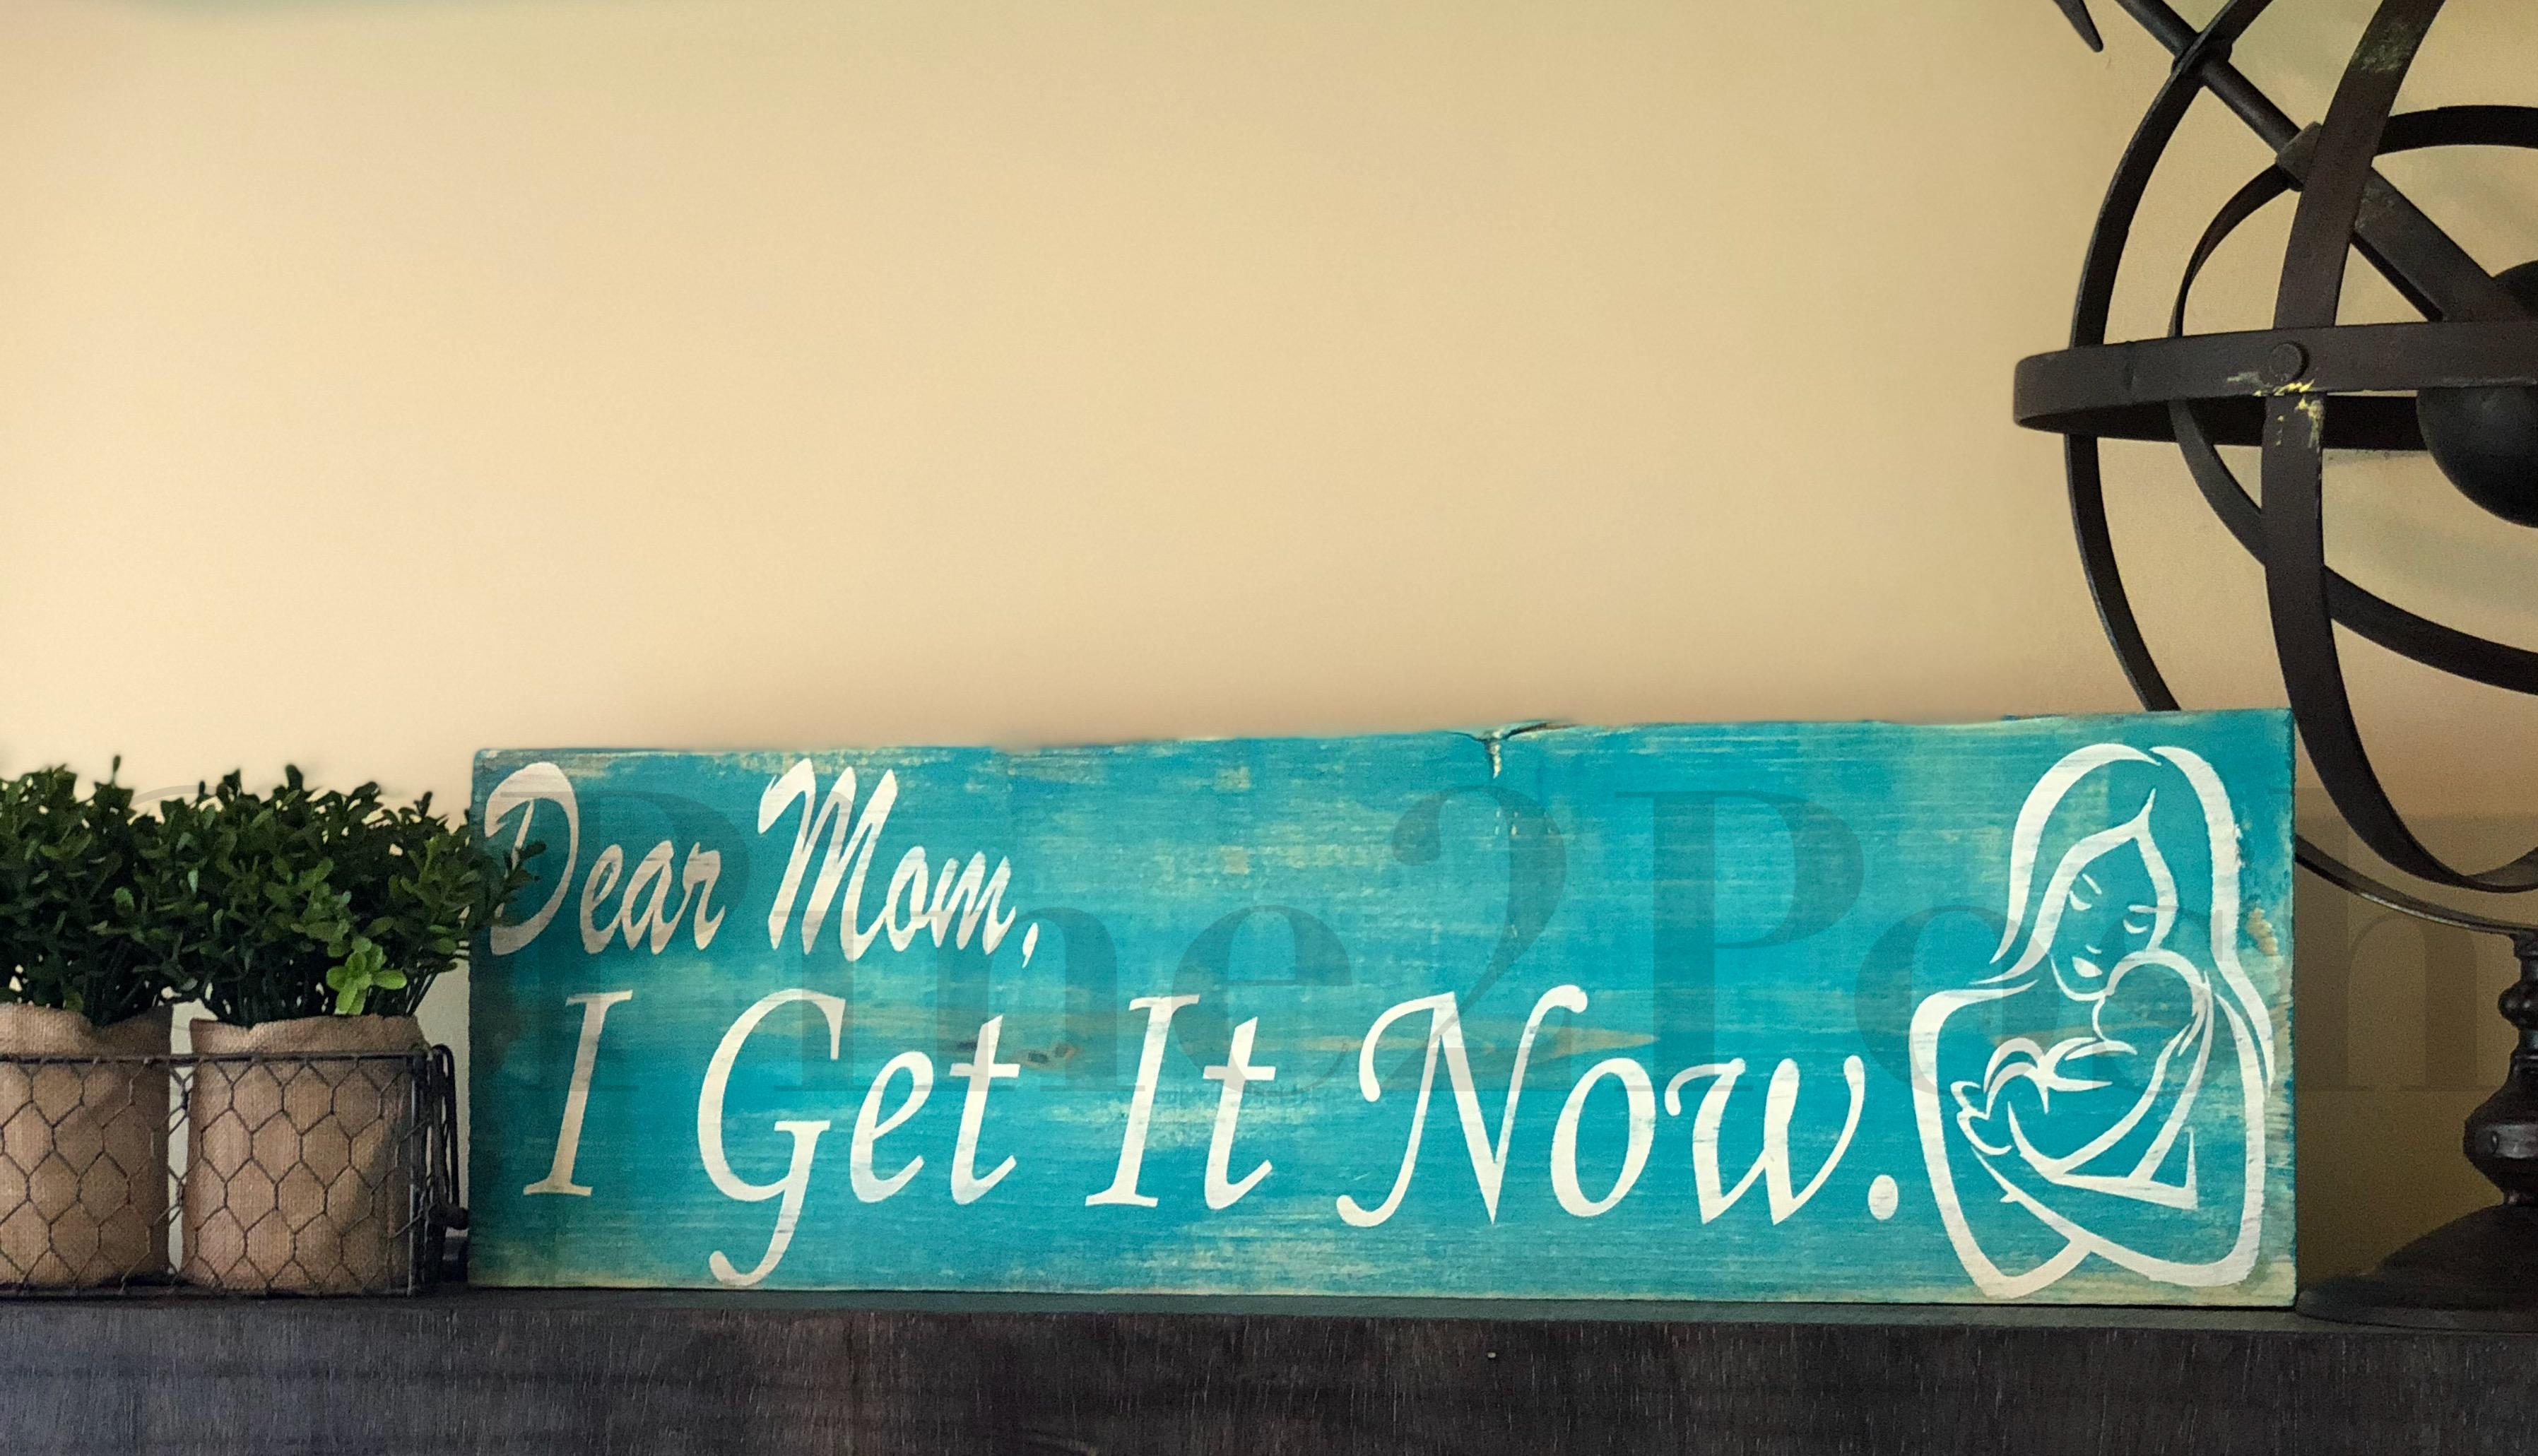 #135 - Dear Mom